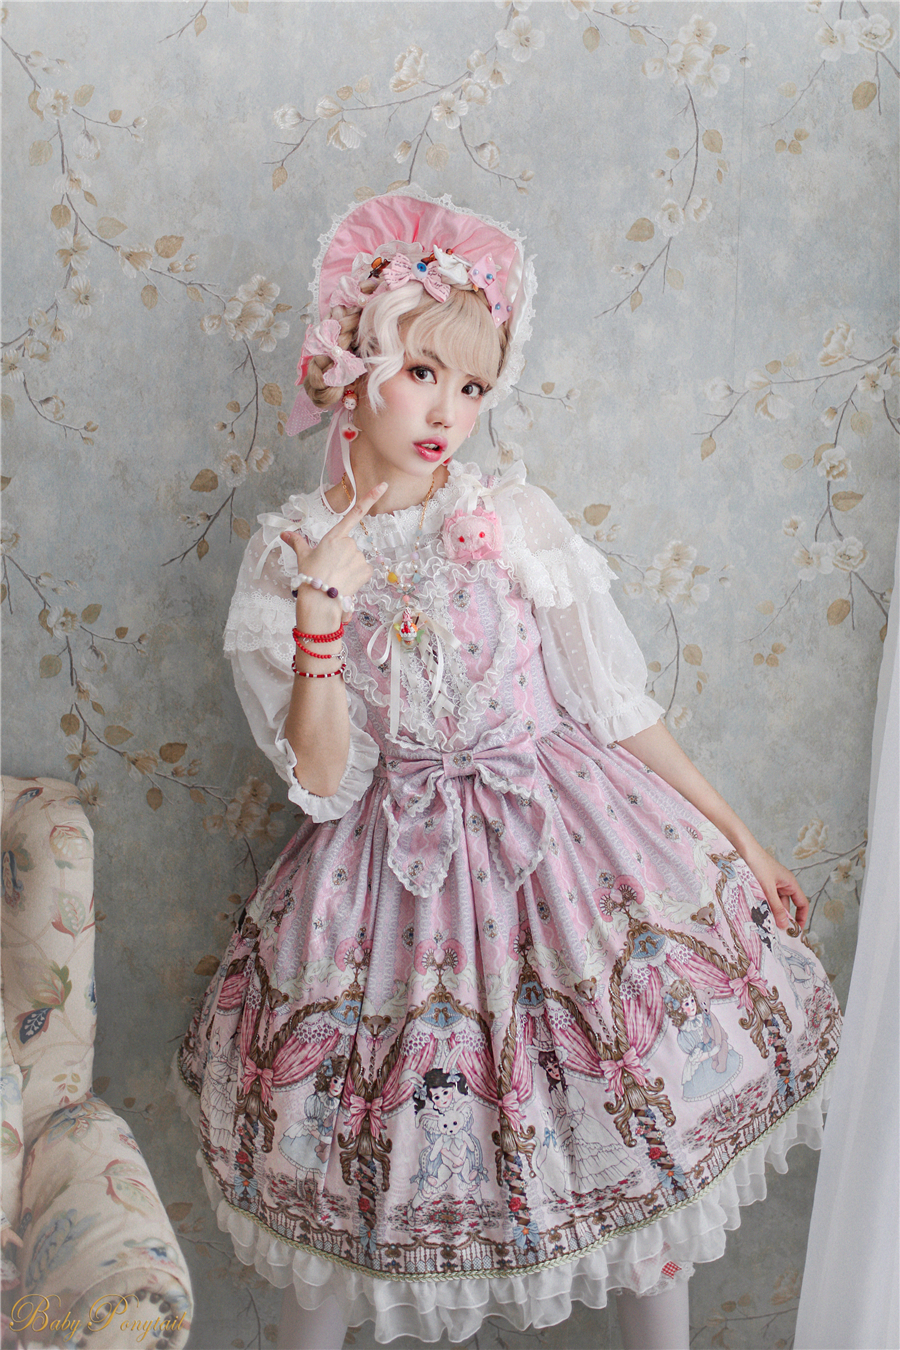 BabyPonytail_Model Photo_My Favorite Companion_JSK Pink_Kaka_07.jpg